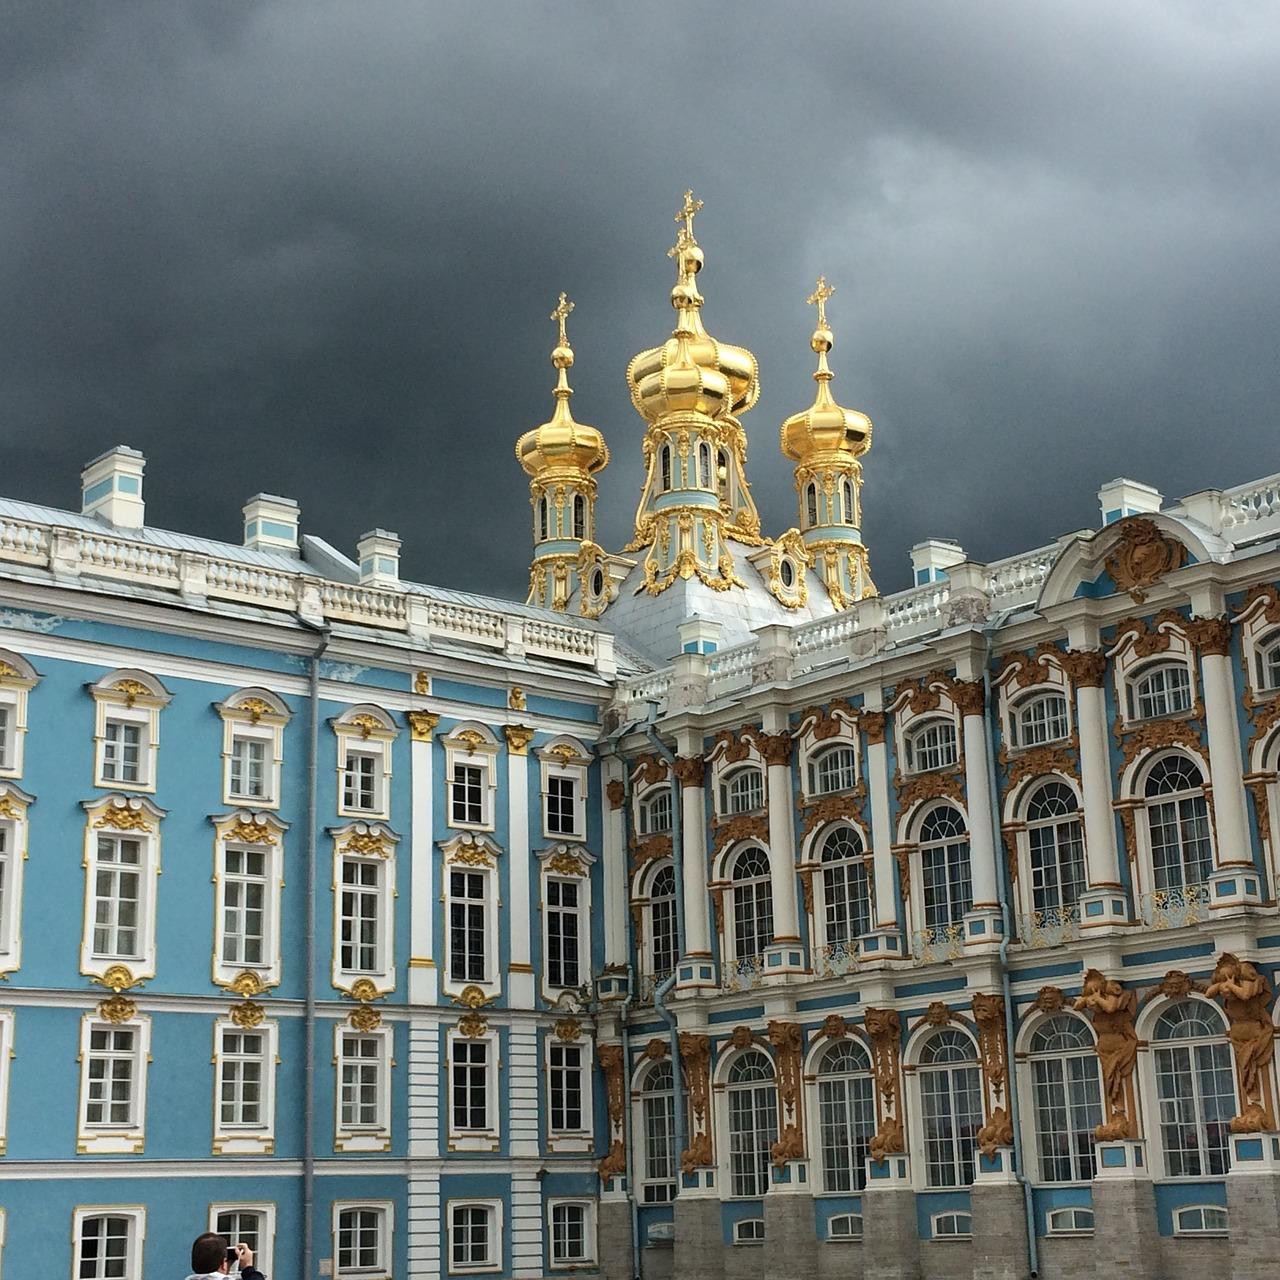 Дворец Екатерины, Санкт Петербург. Фото: suesun